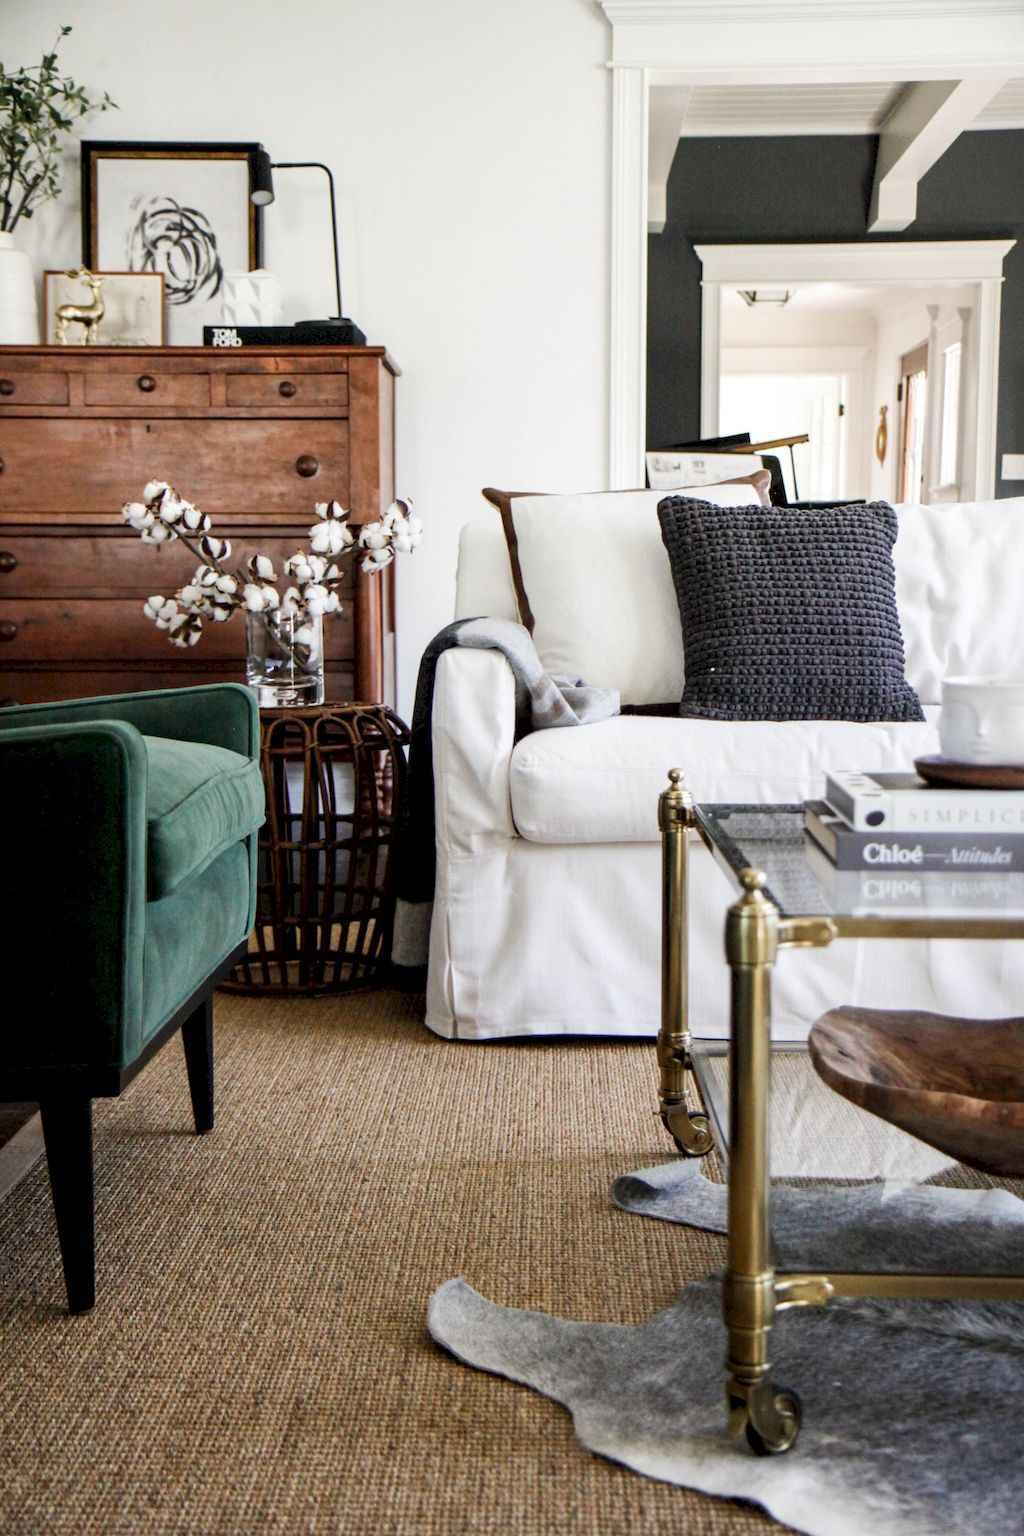 Simple clean vintage living room decorating ideas (16)